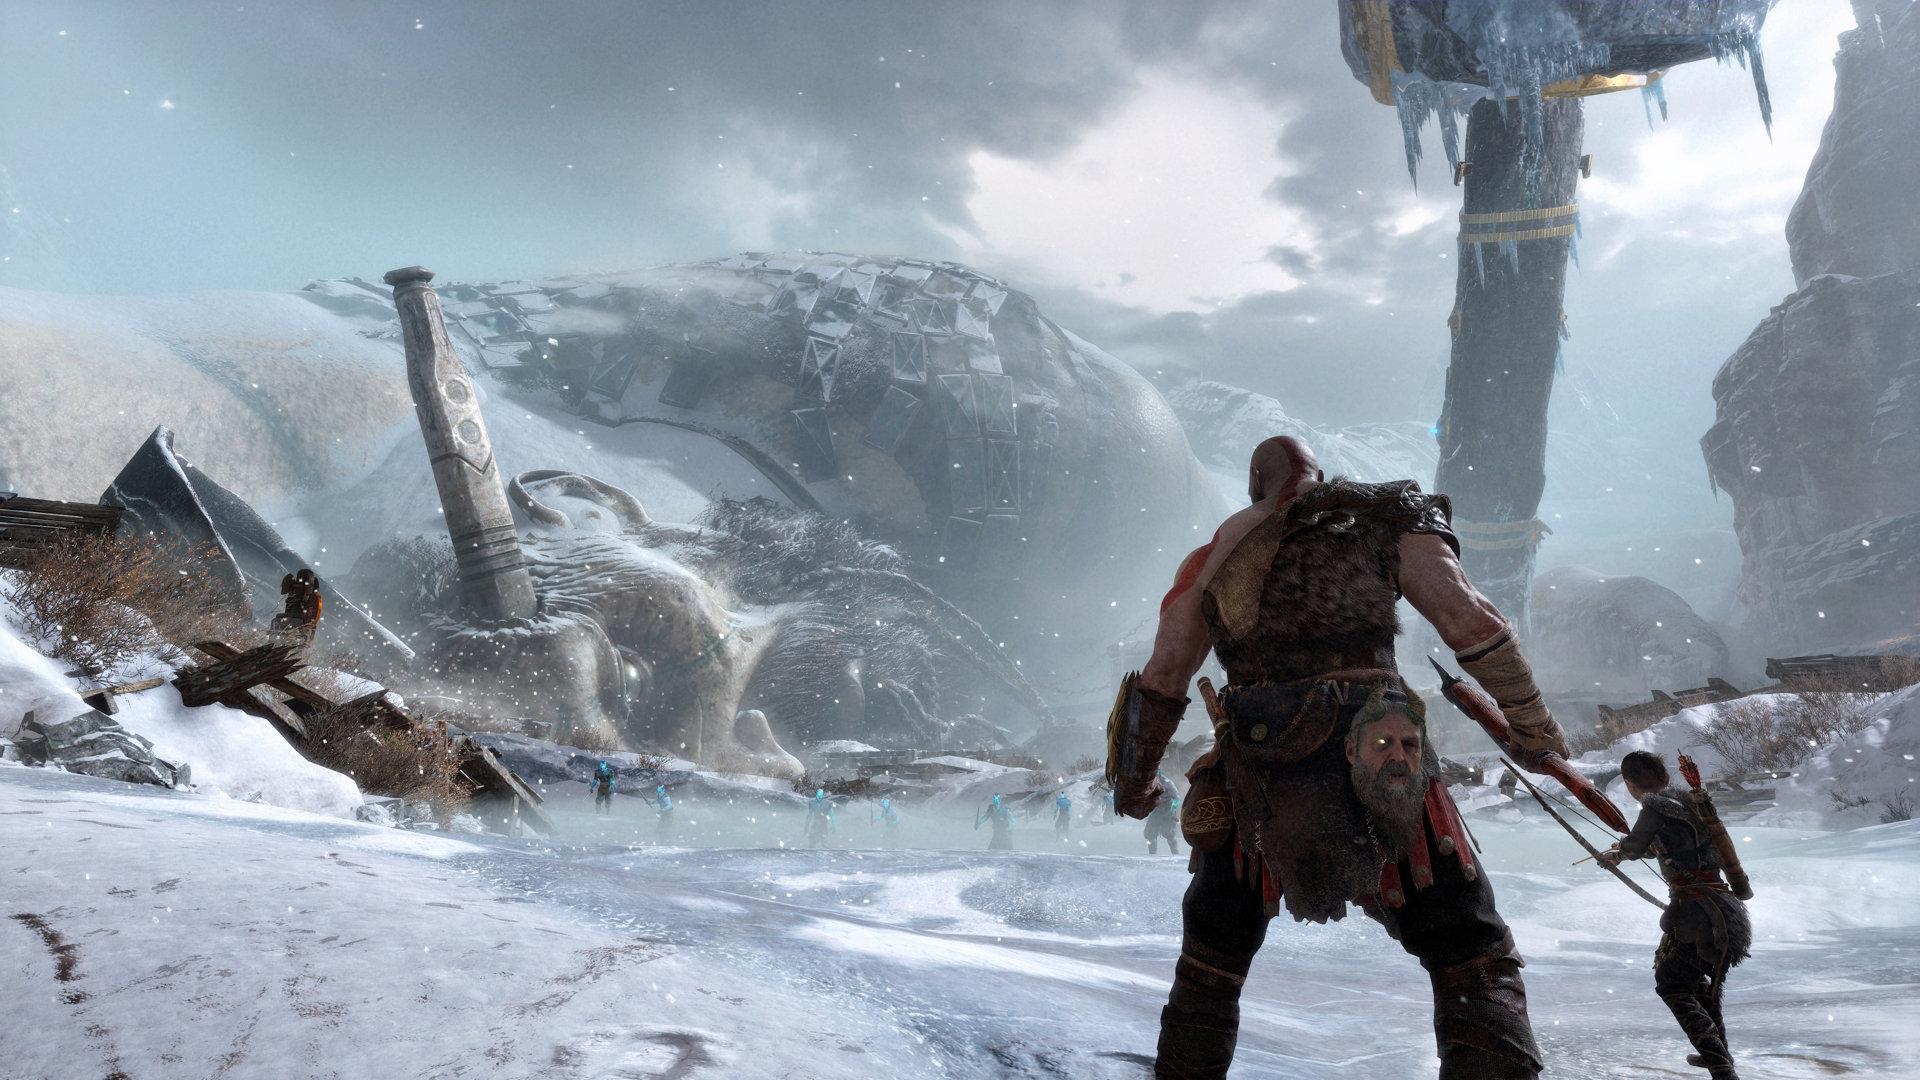 Limited Edition God of War PS4 Pro Bundle Screenshot 6